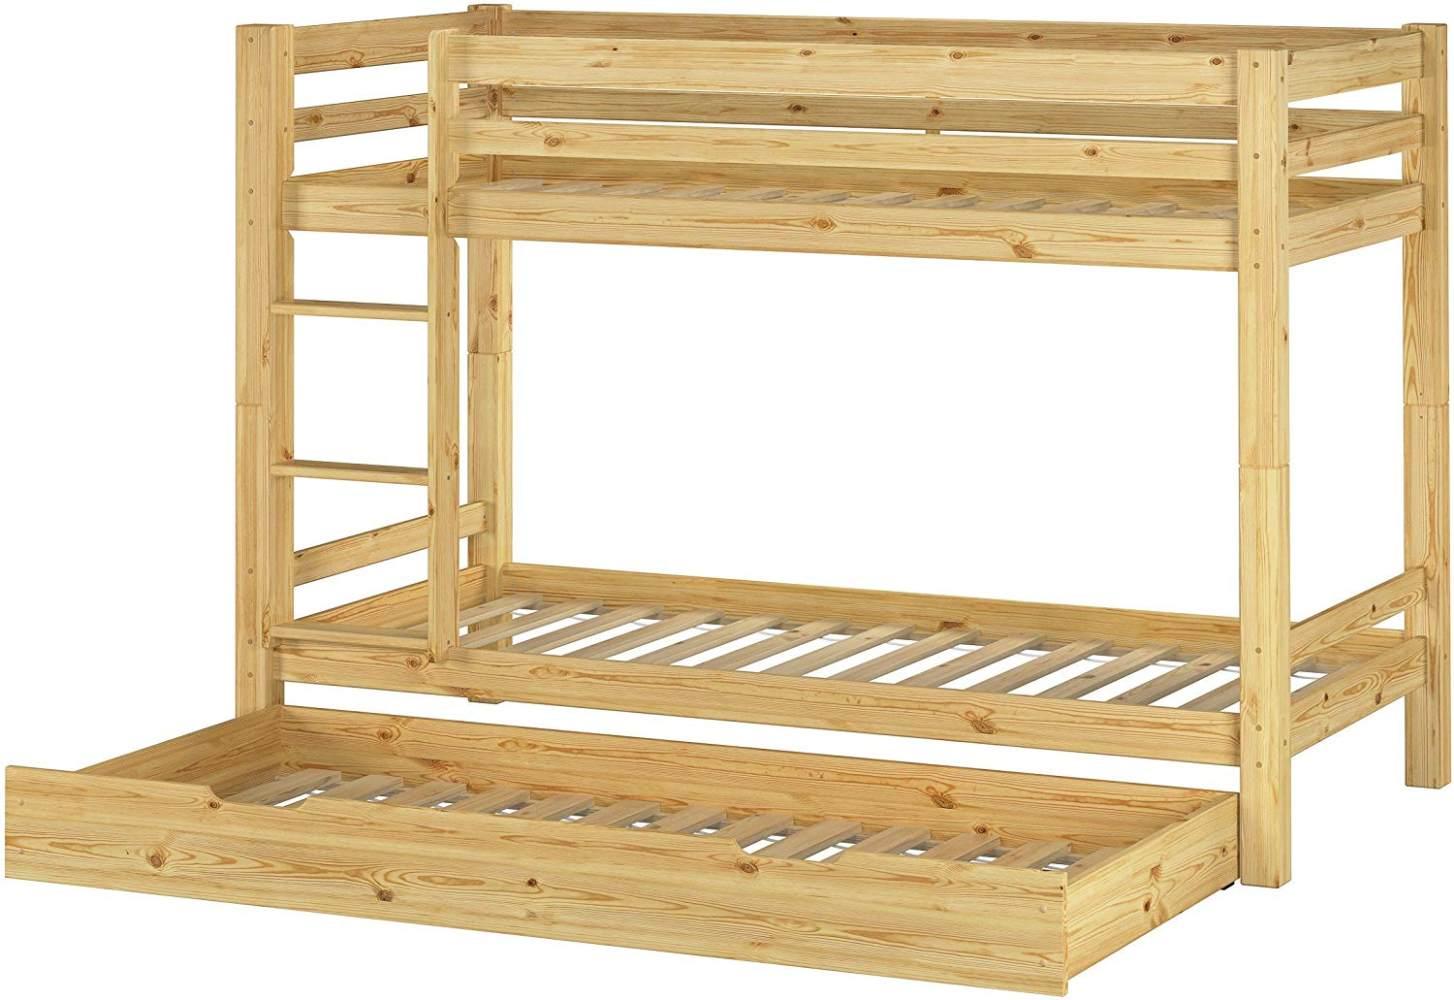 Erst-Holz Etagenbett Kiefer 90x200 cm inkl. Gästebettkasten, natur Bild 1